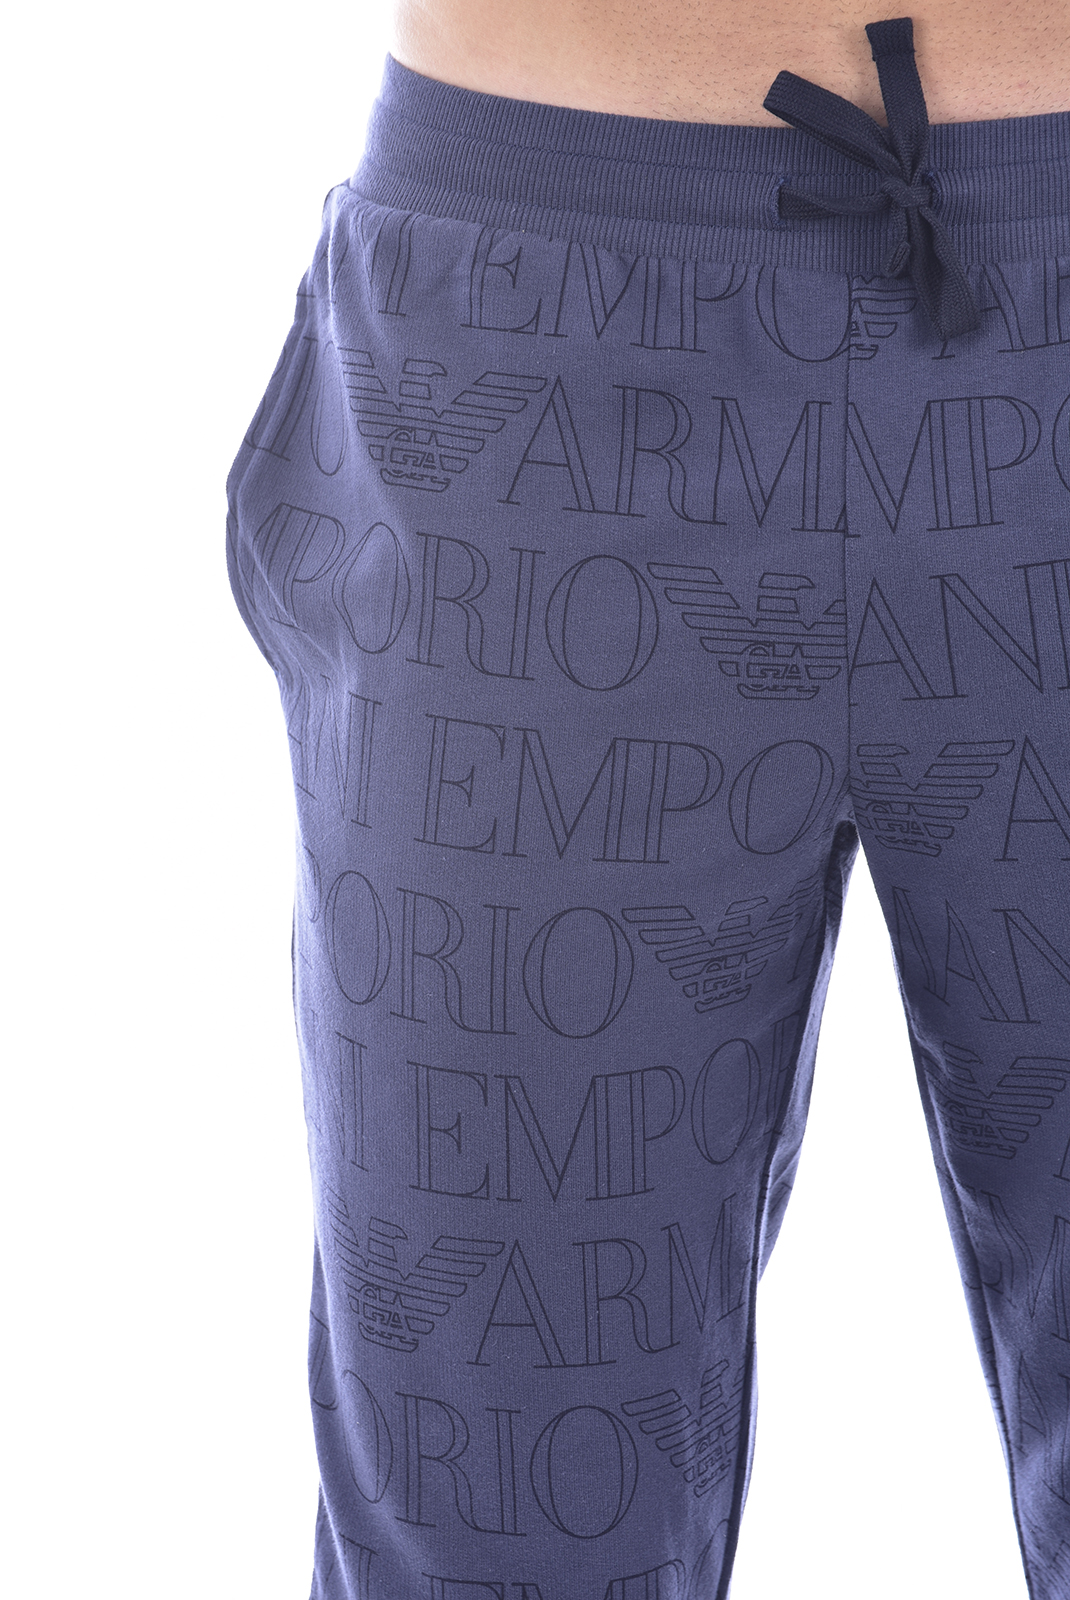 Pantalons sport/streetwear  Emporio armani 111690 0P566 67835 BLU STAMPATO